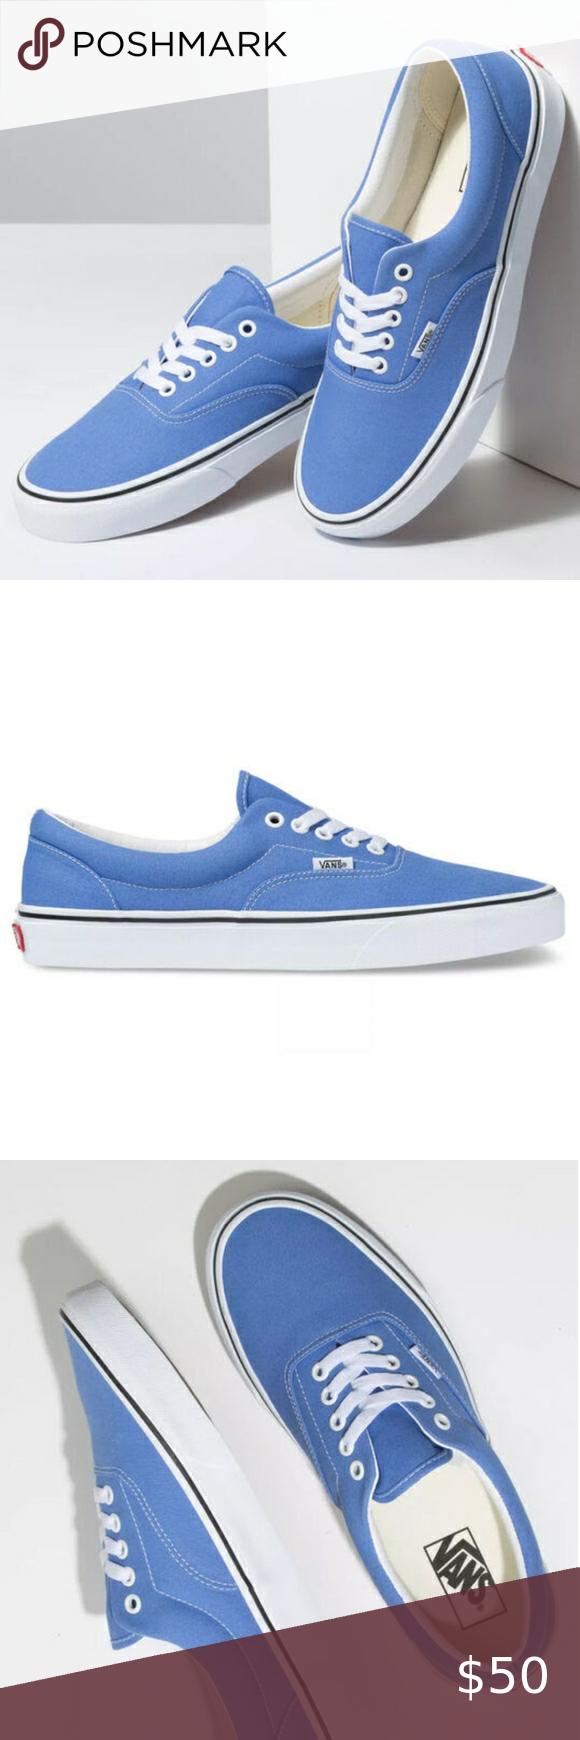 Vans Light Blue Low Top Womens Casual